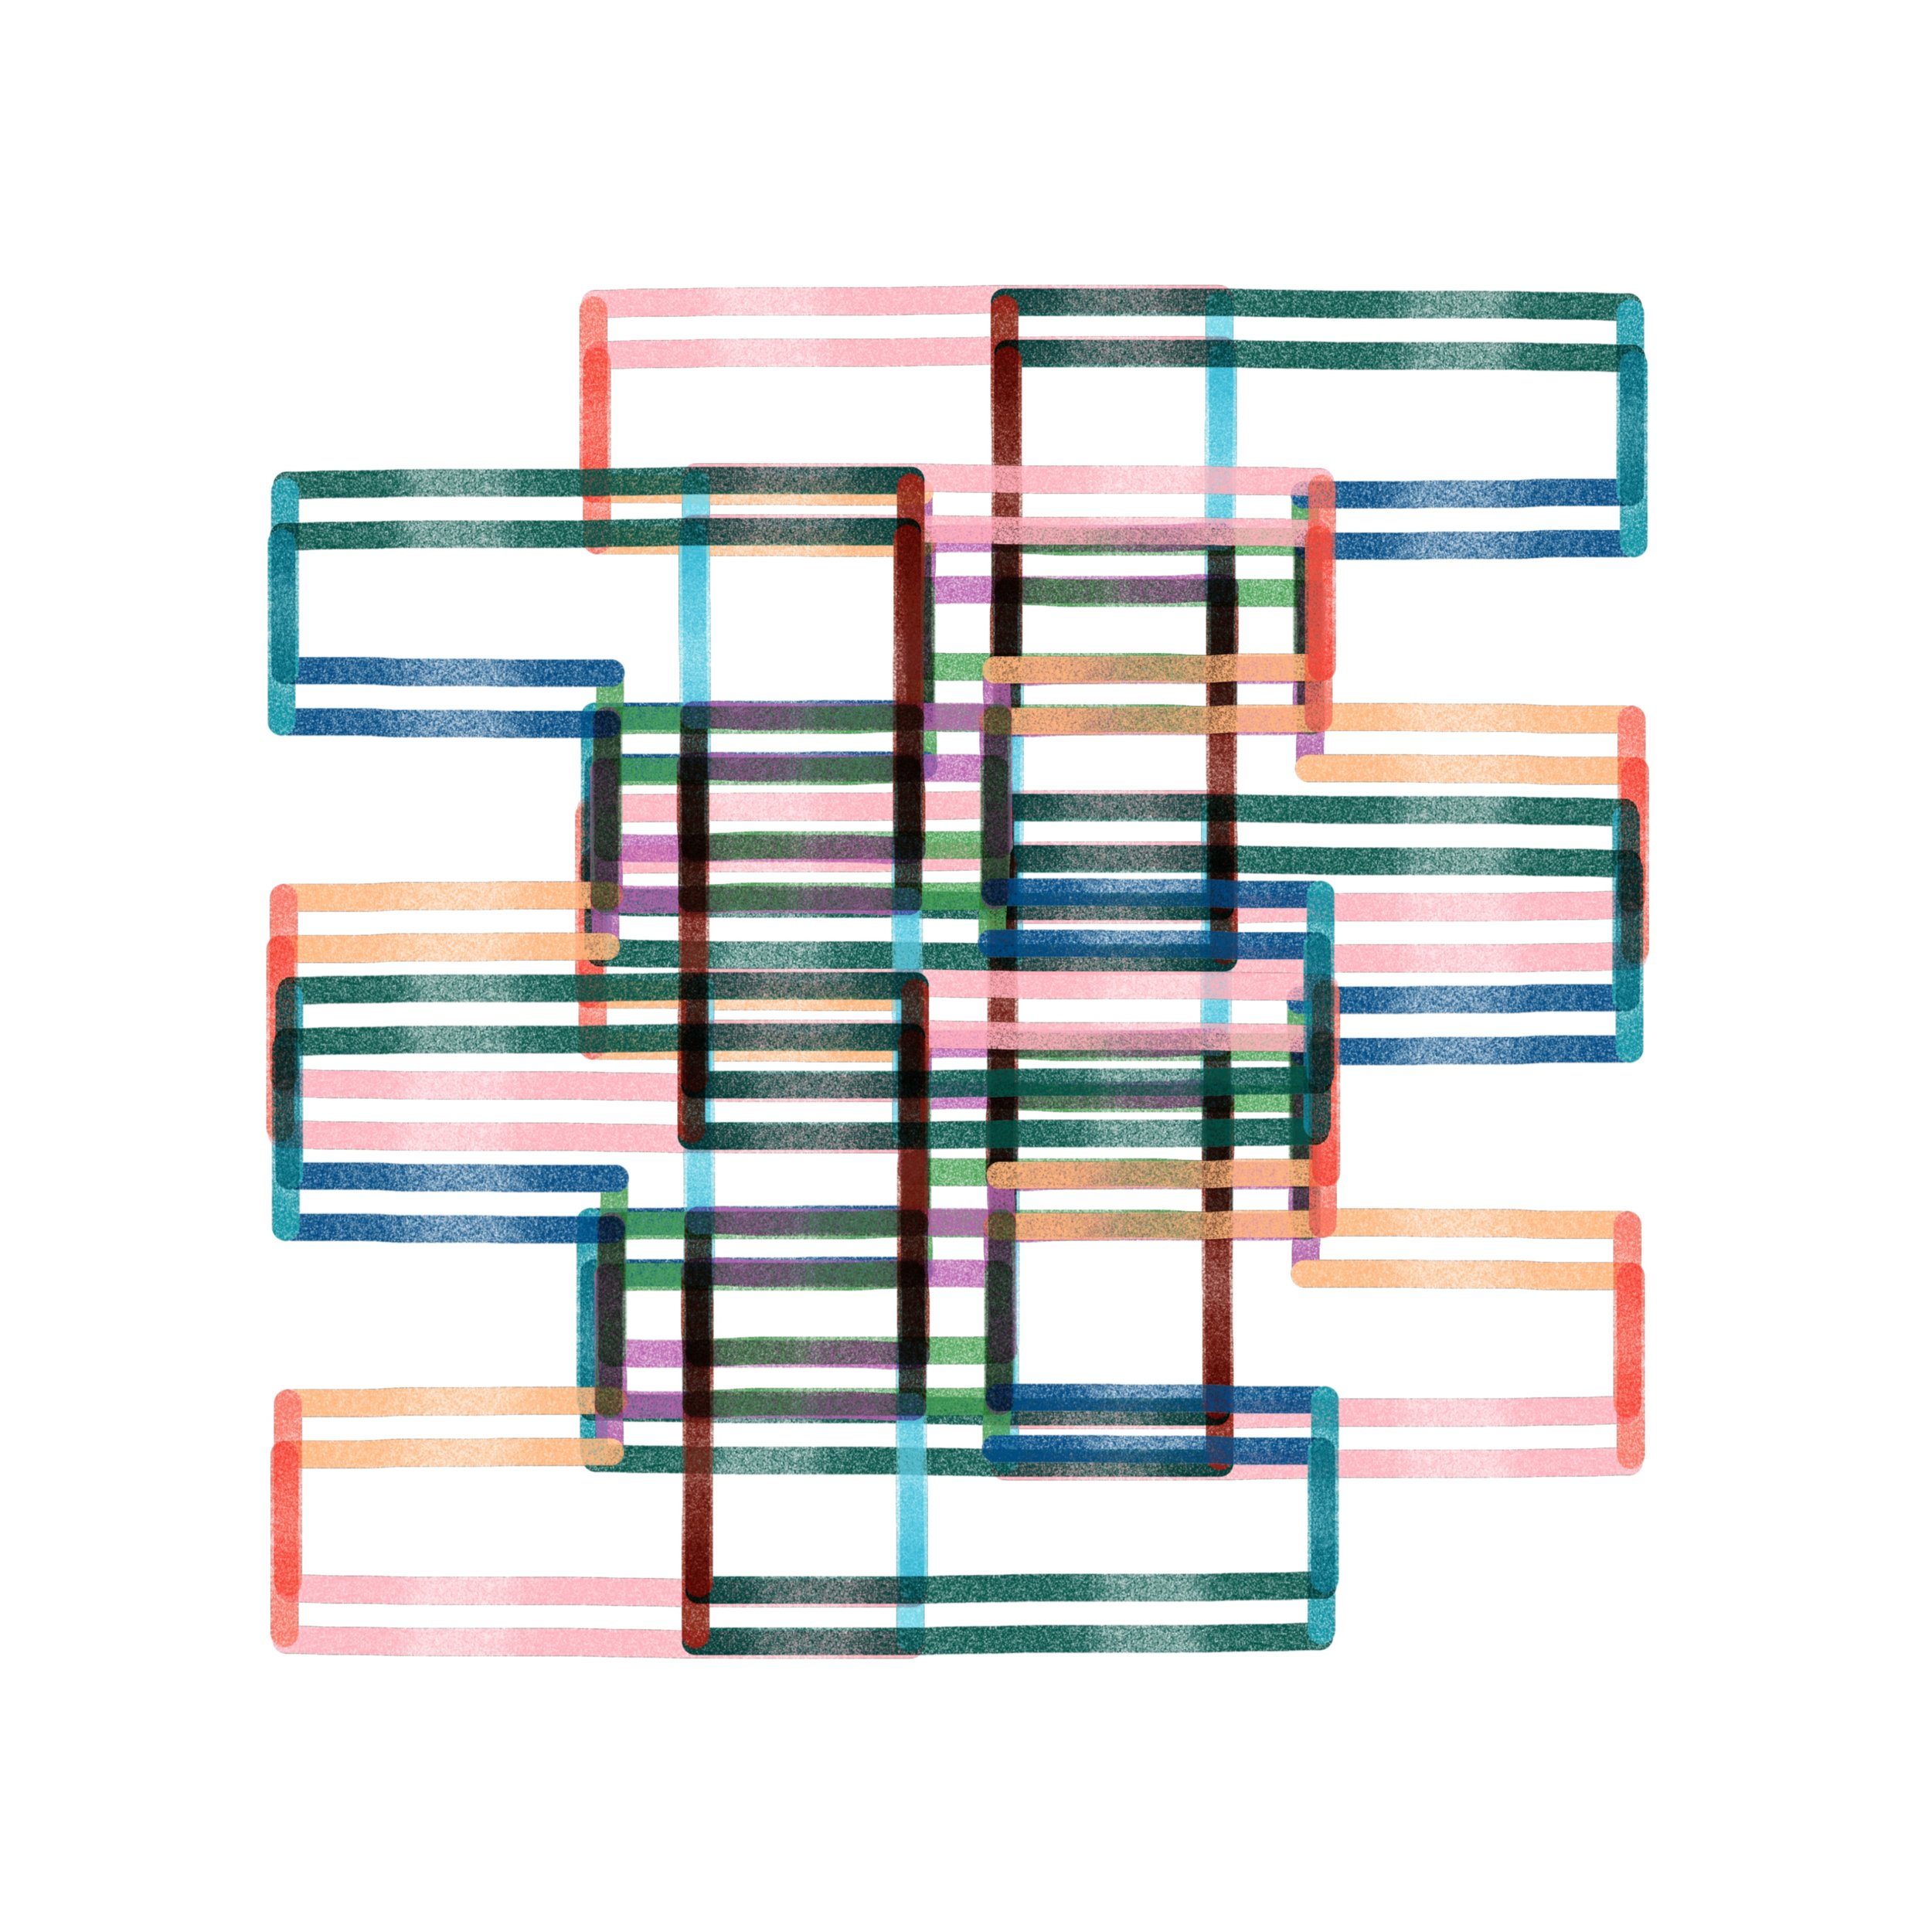 Kinetic Lines 18